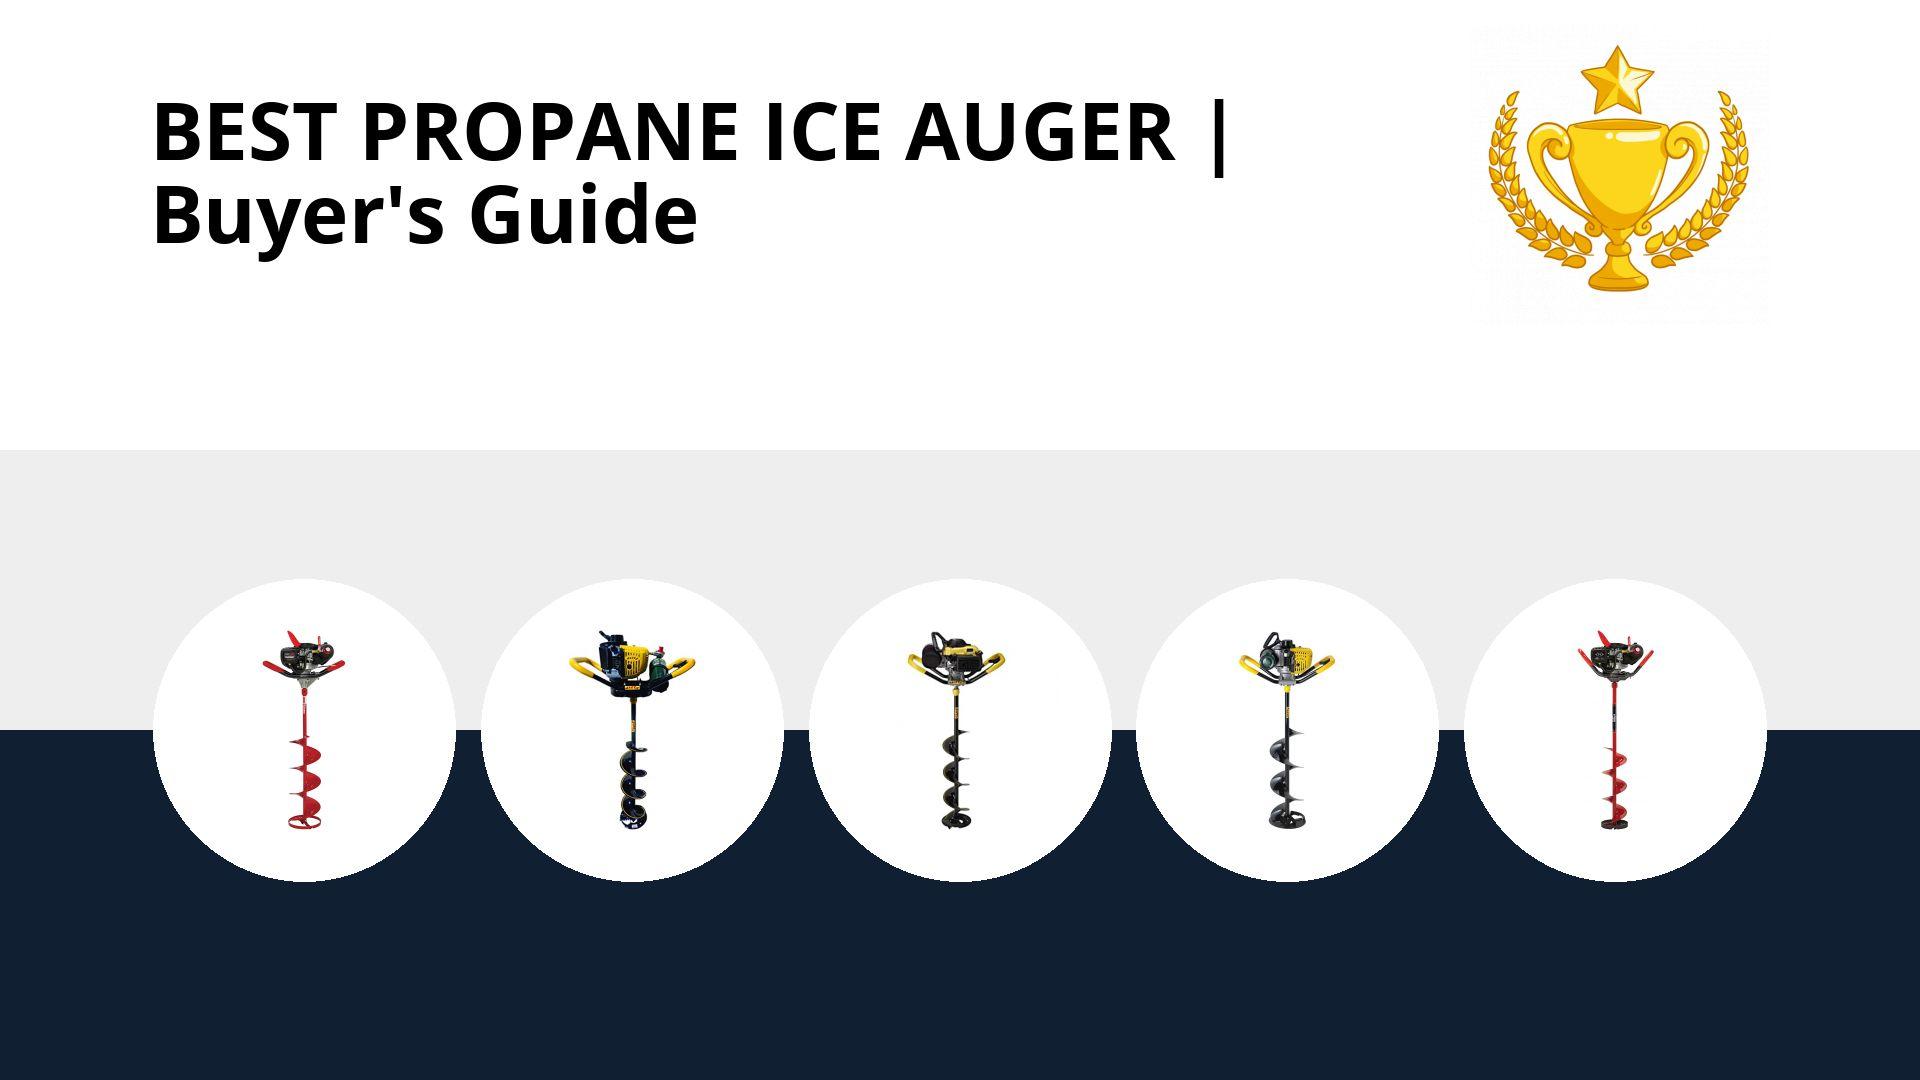 Best Propane Ice Auger: image